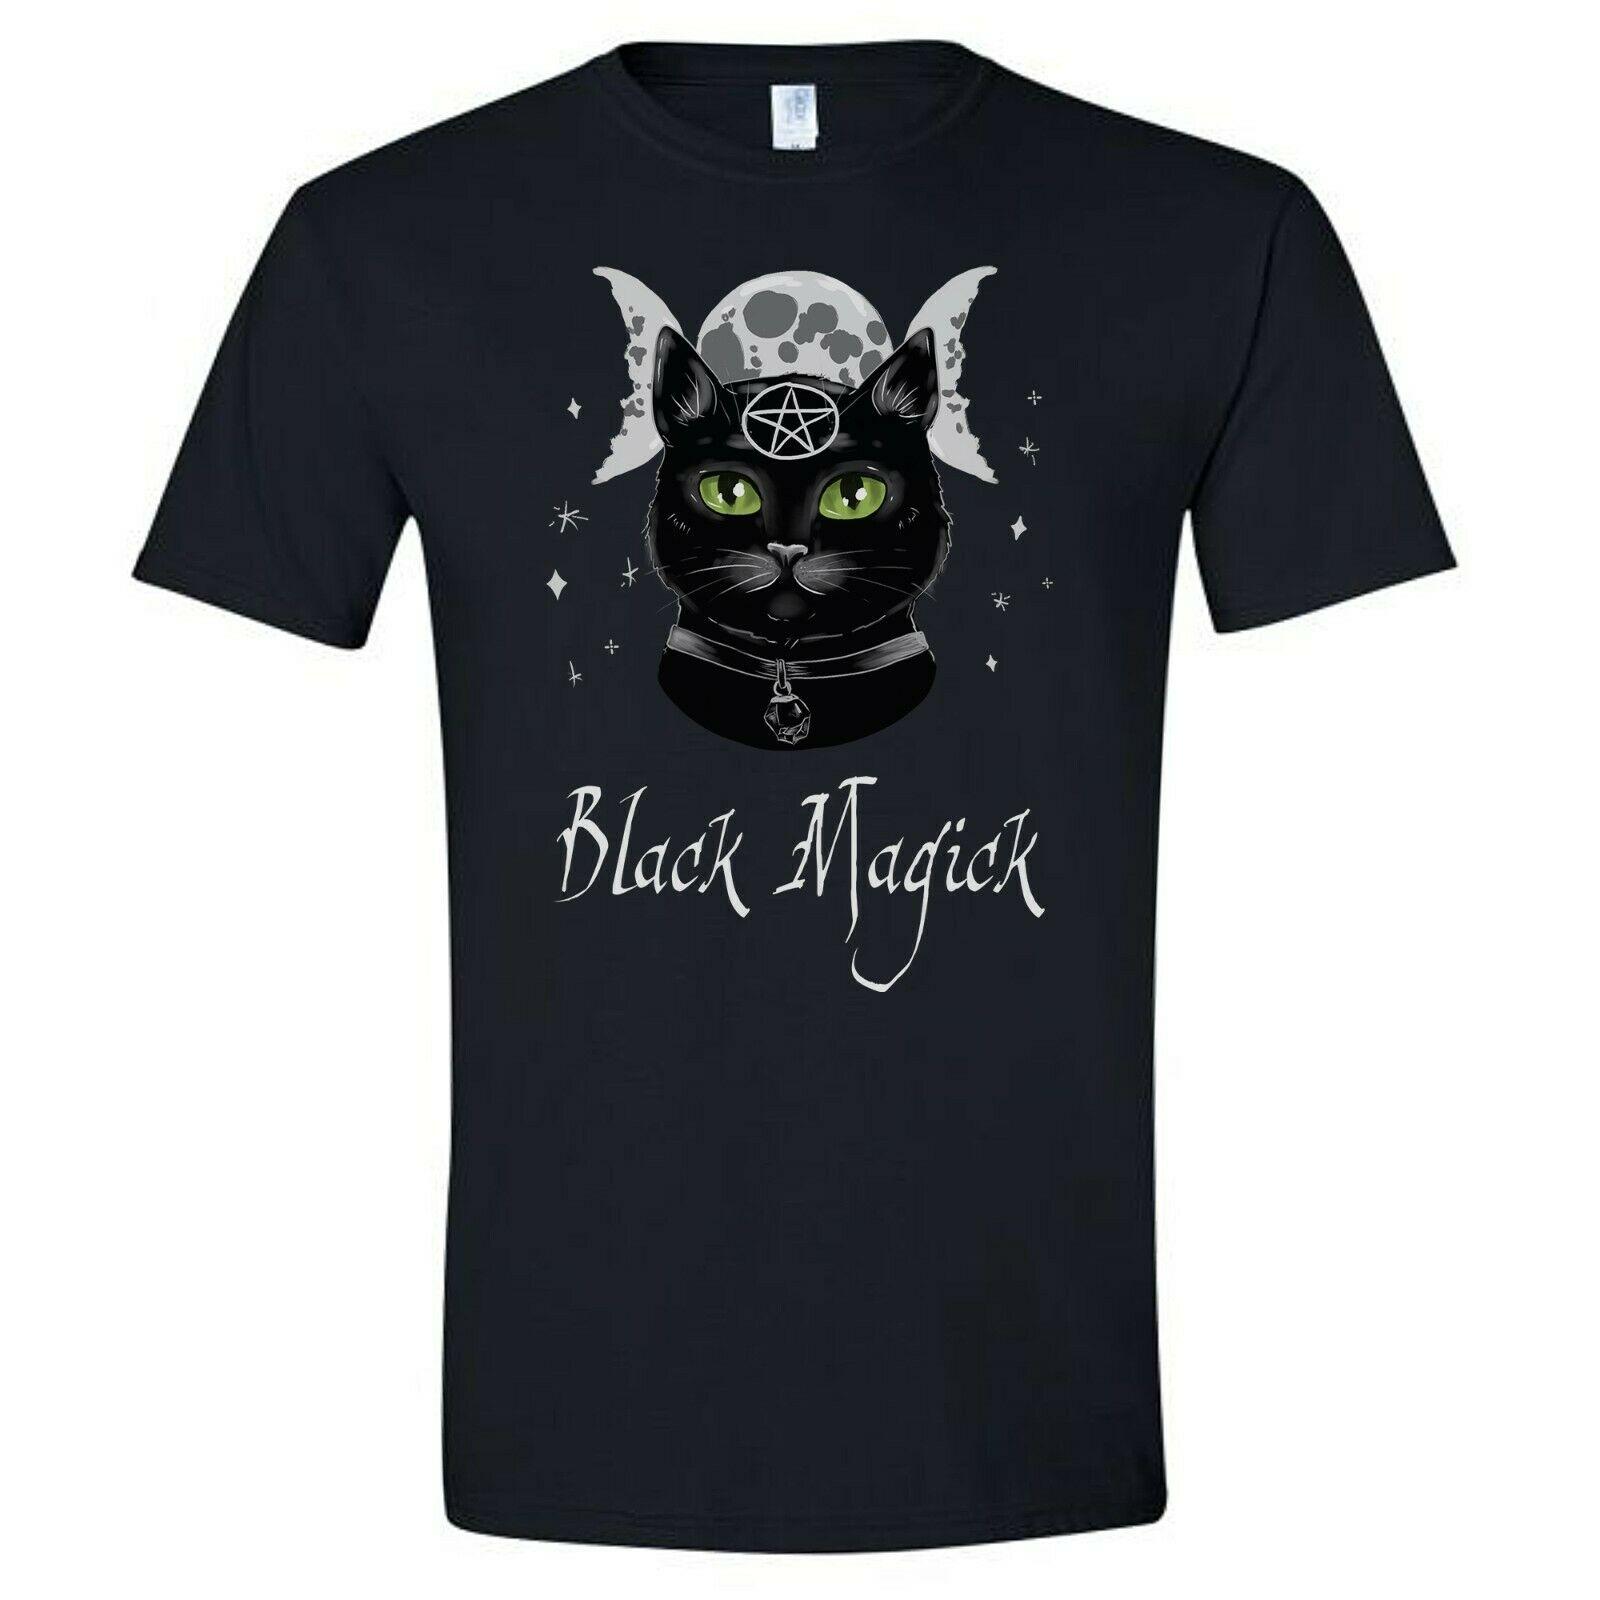 Preto magick camisa gato pagão triplo lua deusa bruxa wicca samhain wiccan presente